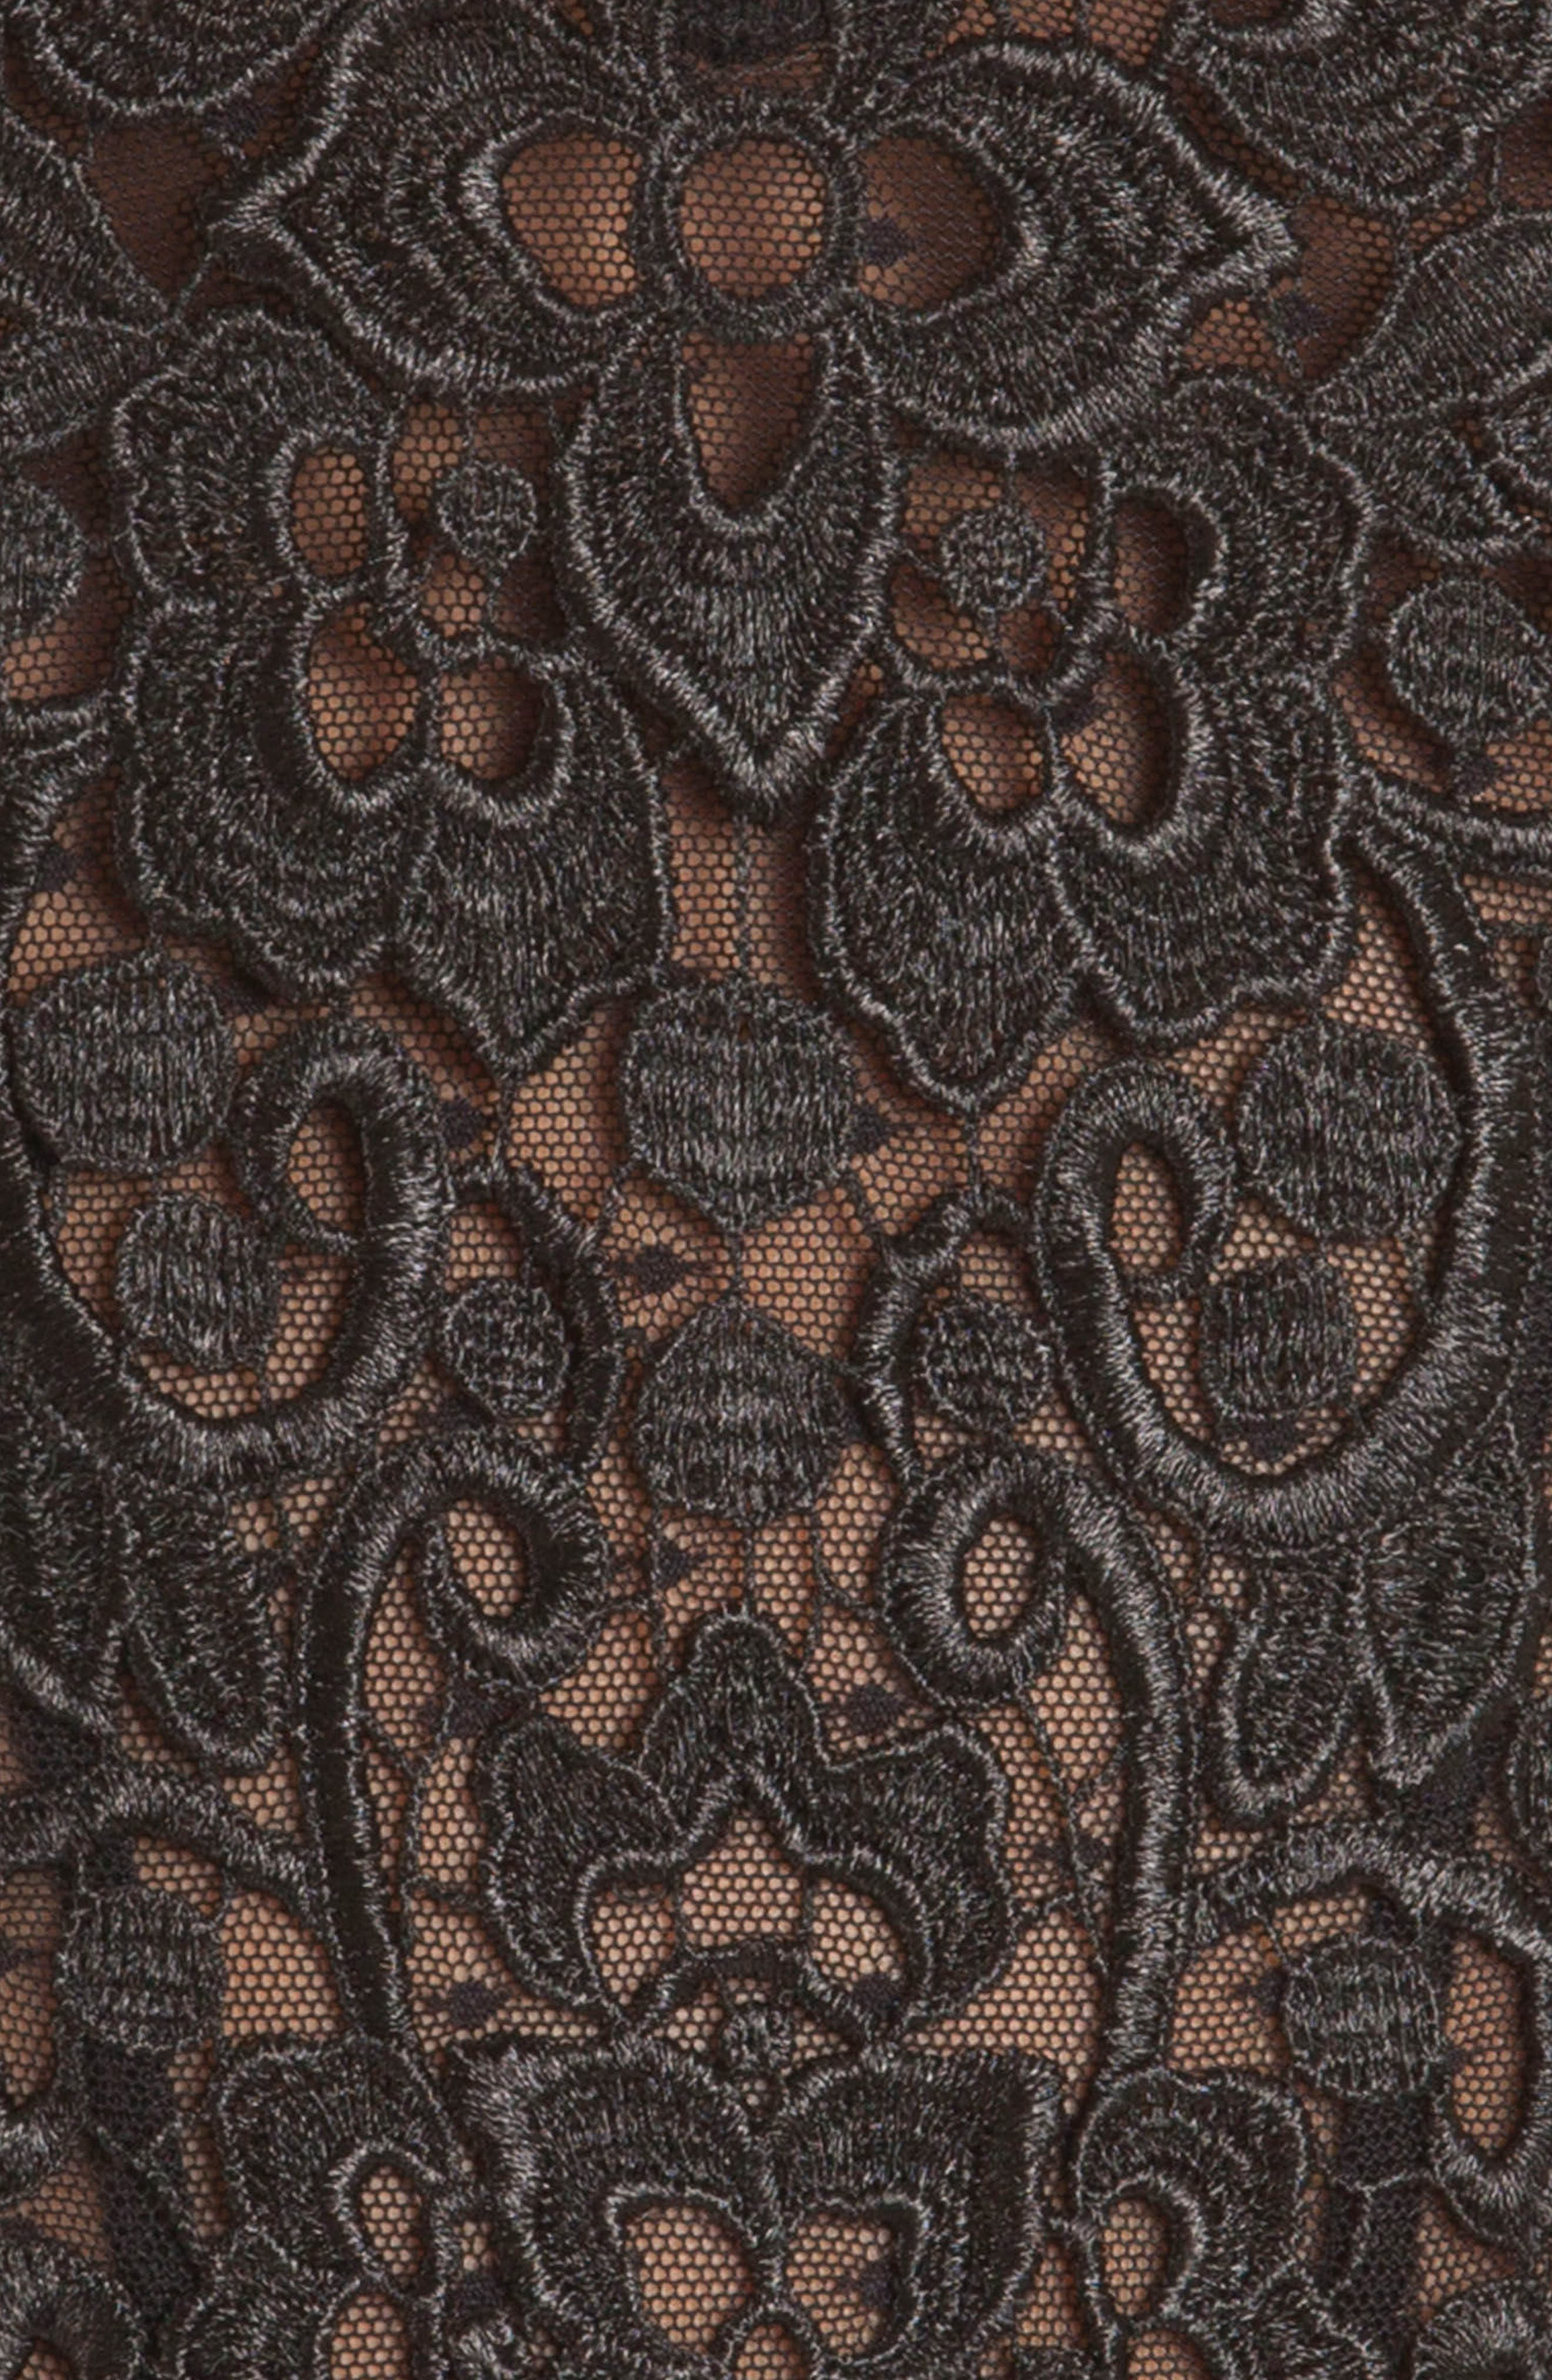 Byzantine Lace & Mesh Teddy,                             Alternate thumbnail 7, color,